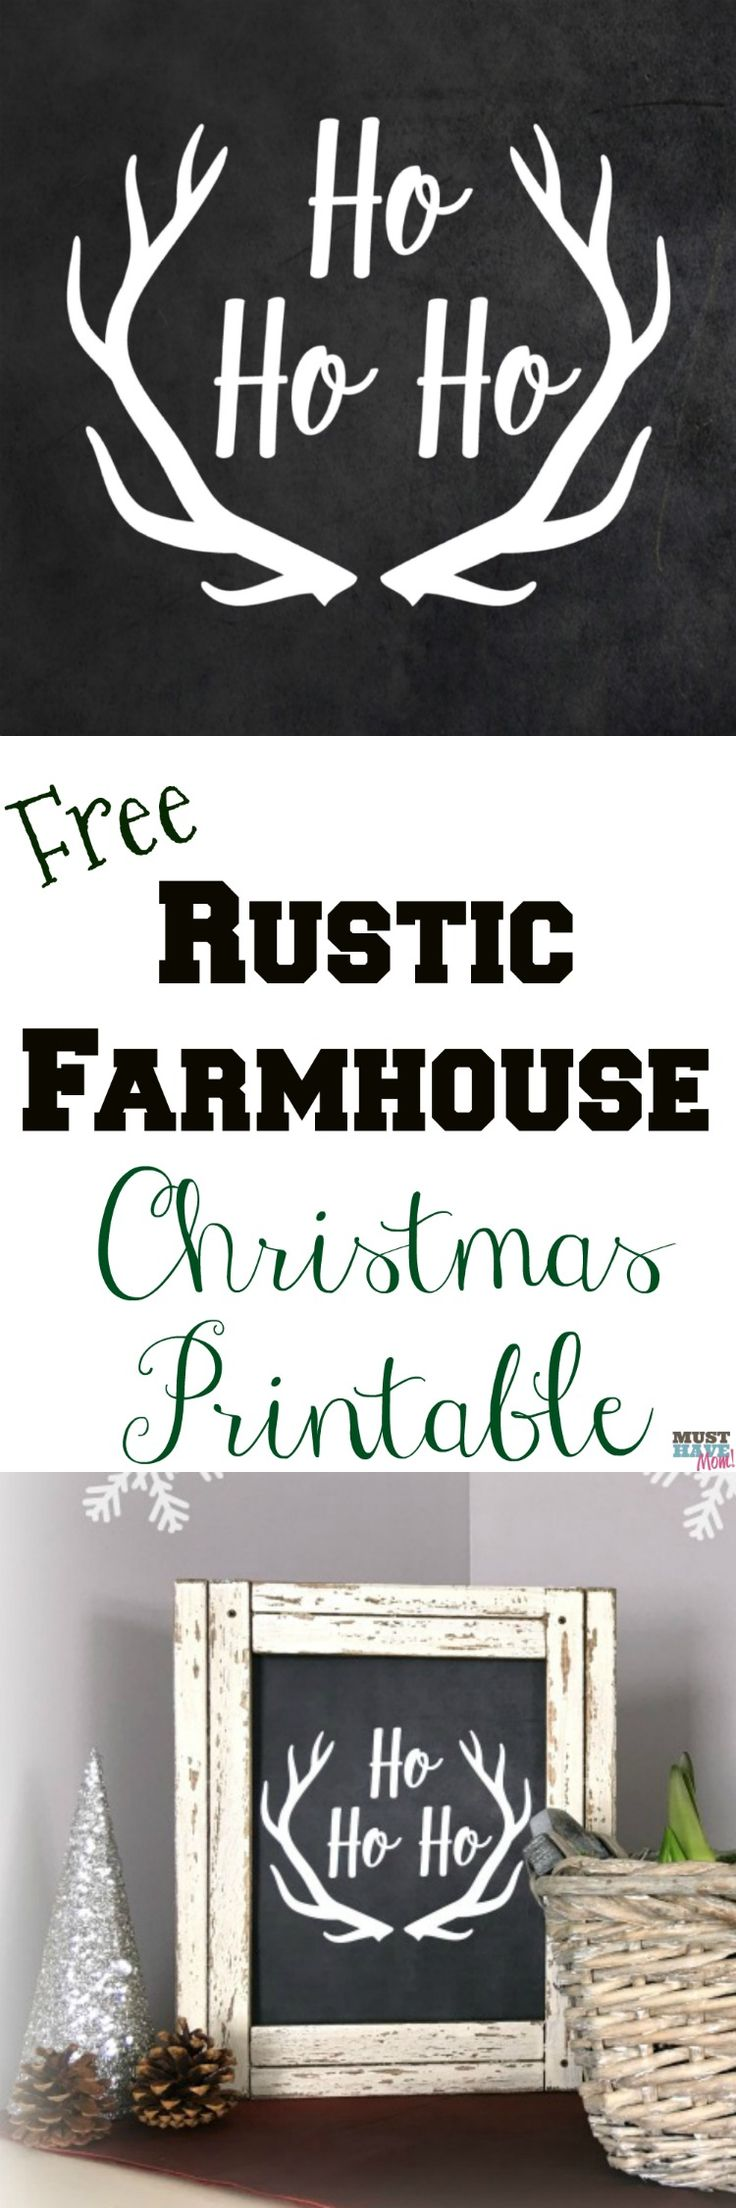 Free rustic farmhouse Christmas printable! Love this Christmas farmhouse decor idea. Free Christmas printable Ho Ho Ho rustic chalkboard sign is perfect for farmhouse decor idea!